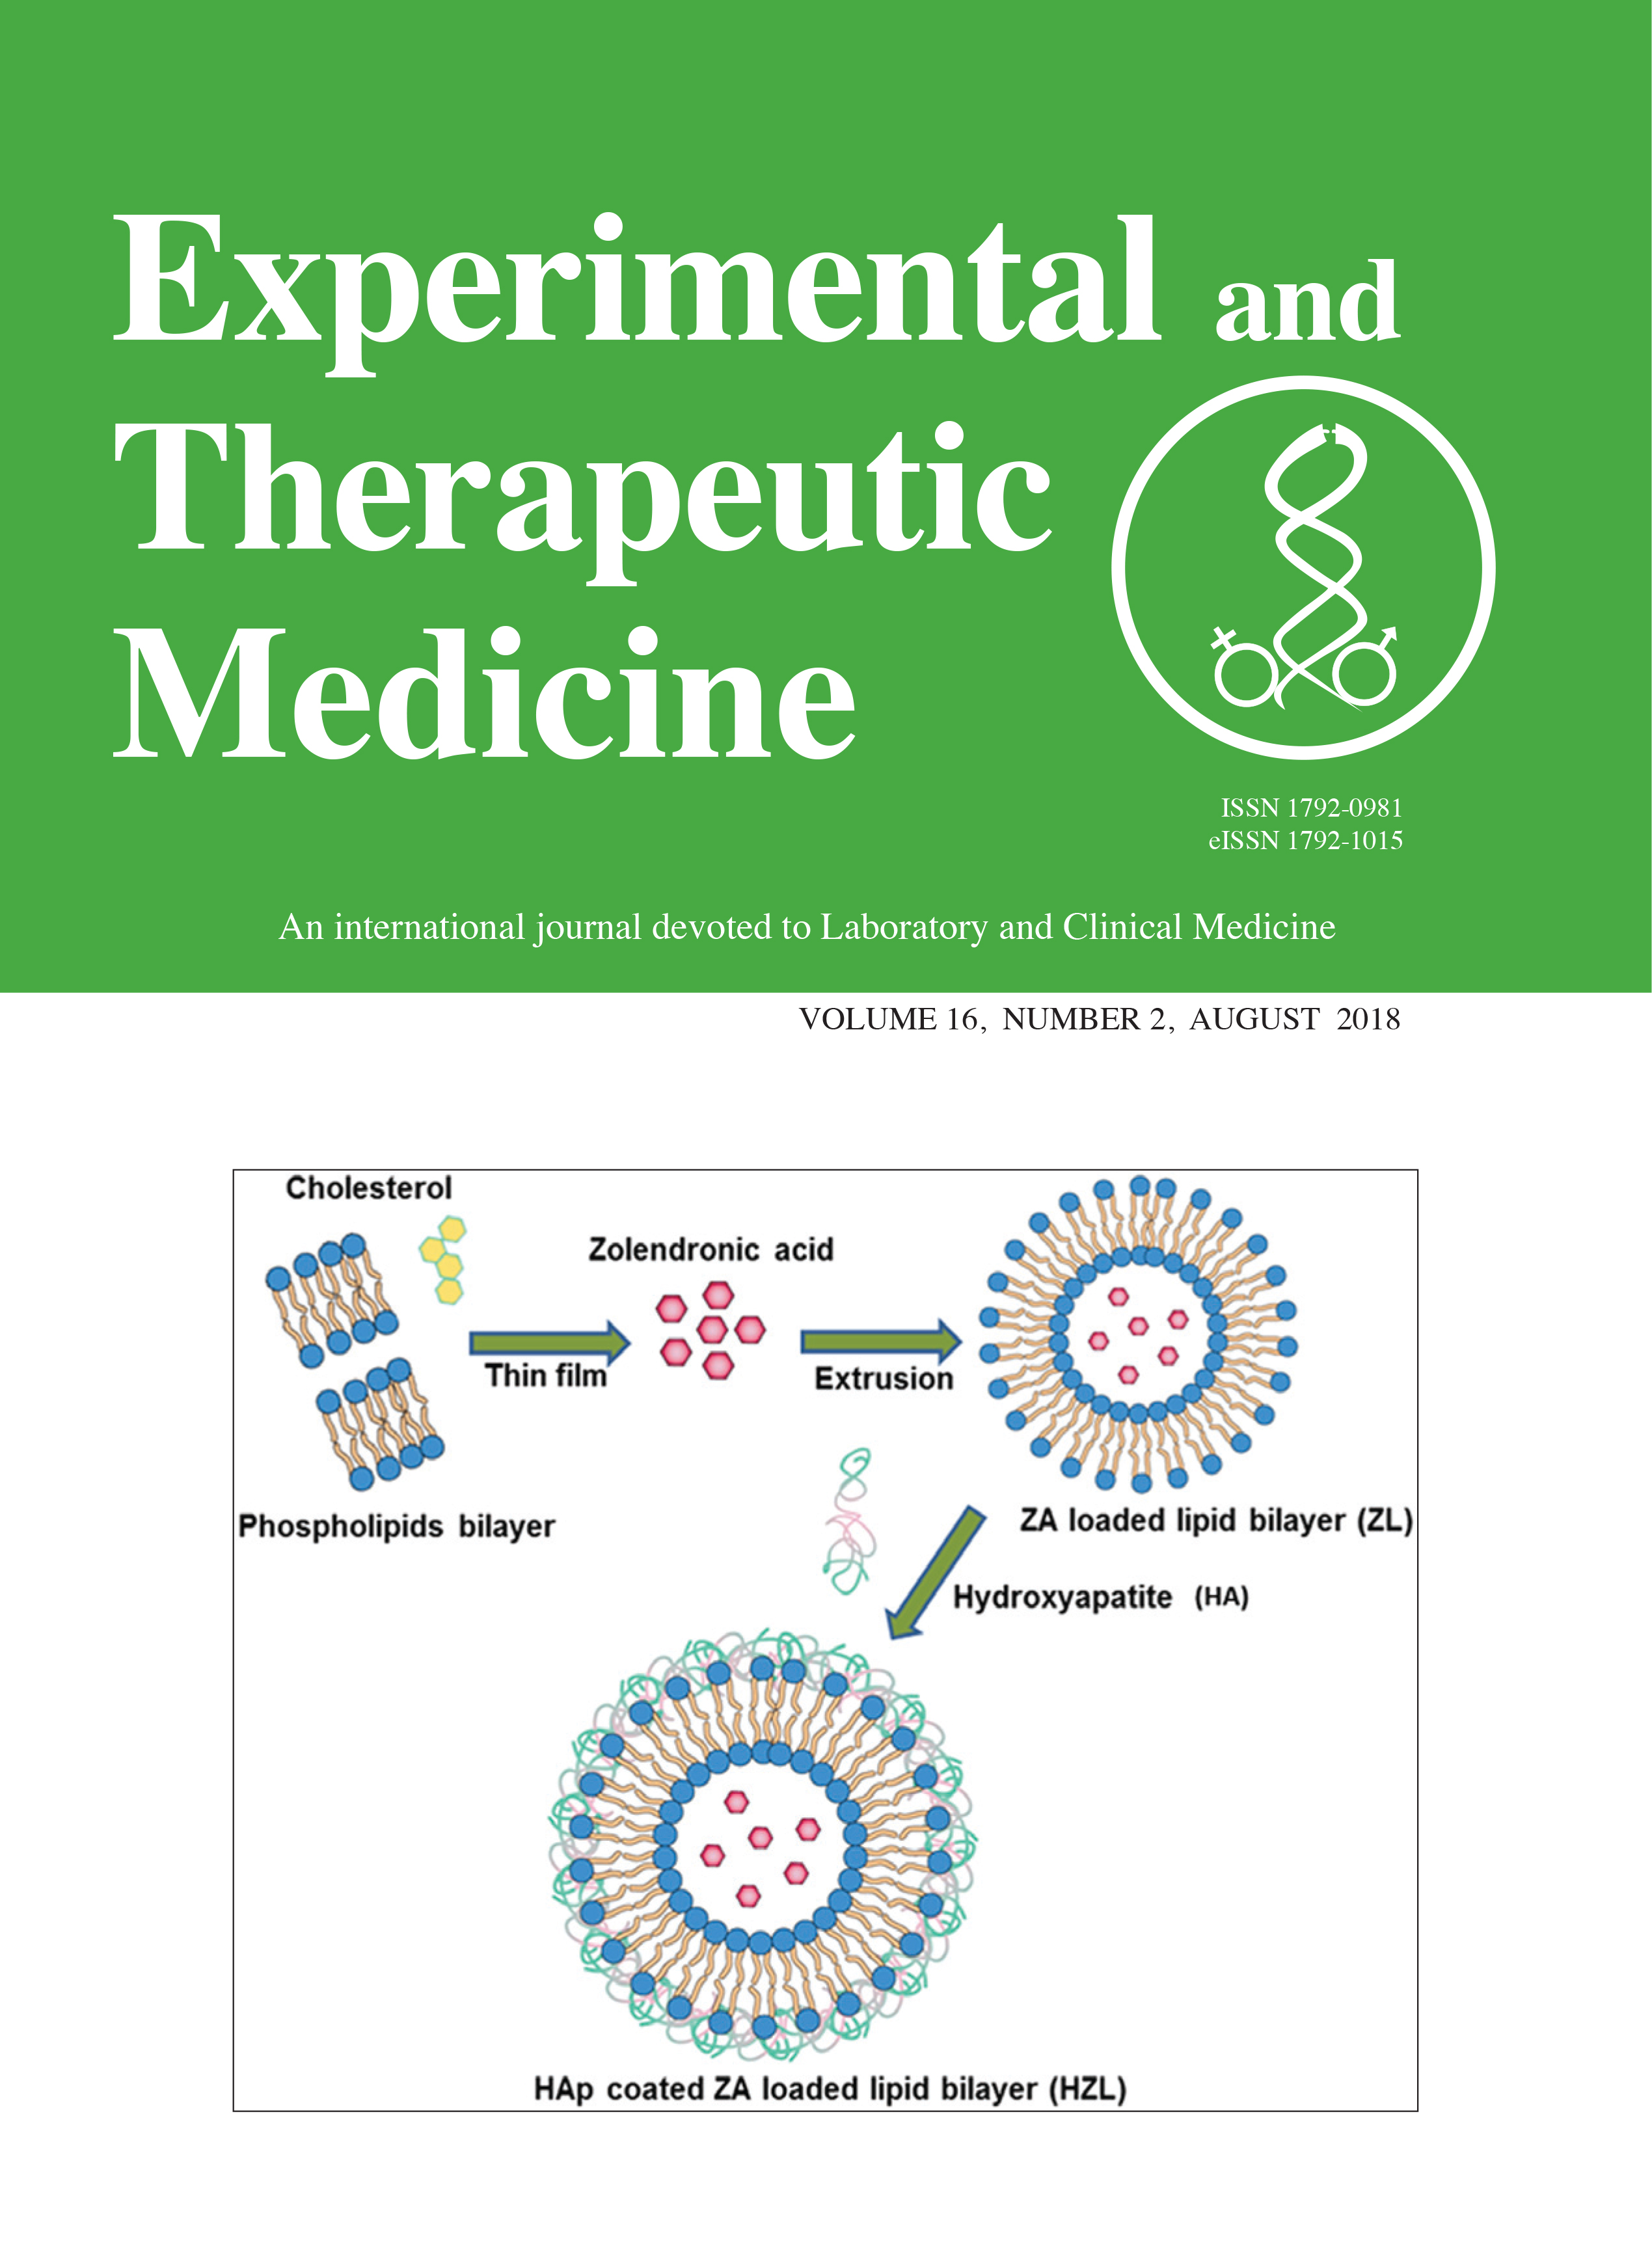 Experimental and Therapeutic Medicine